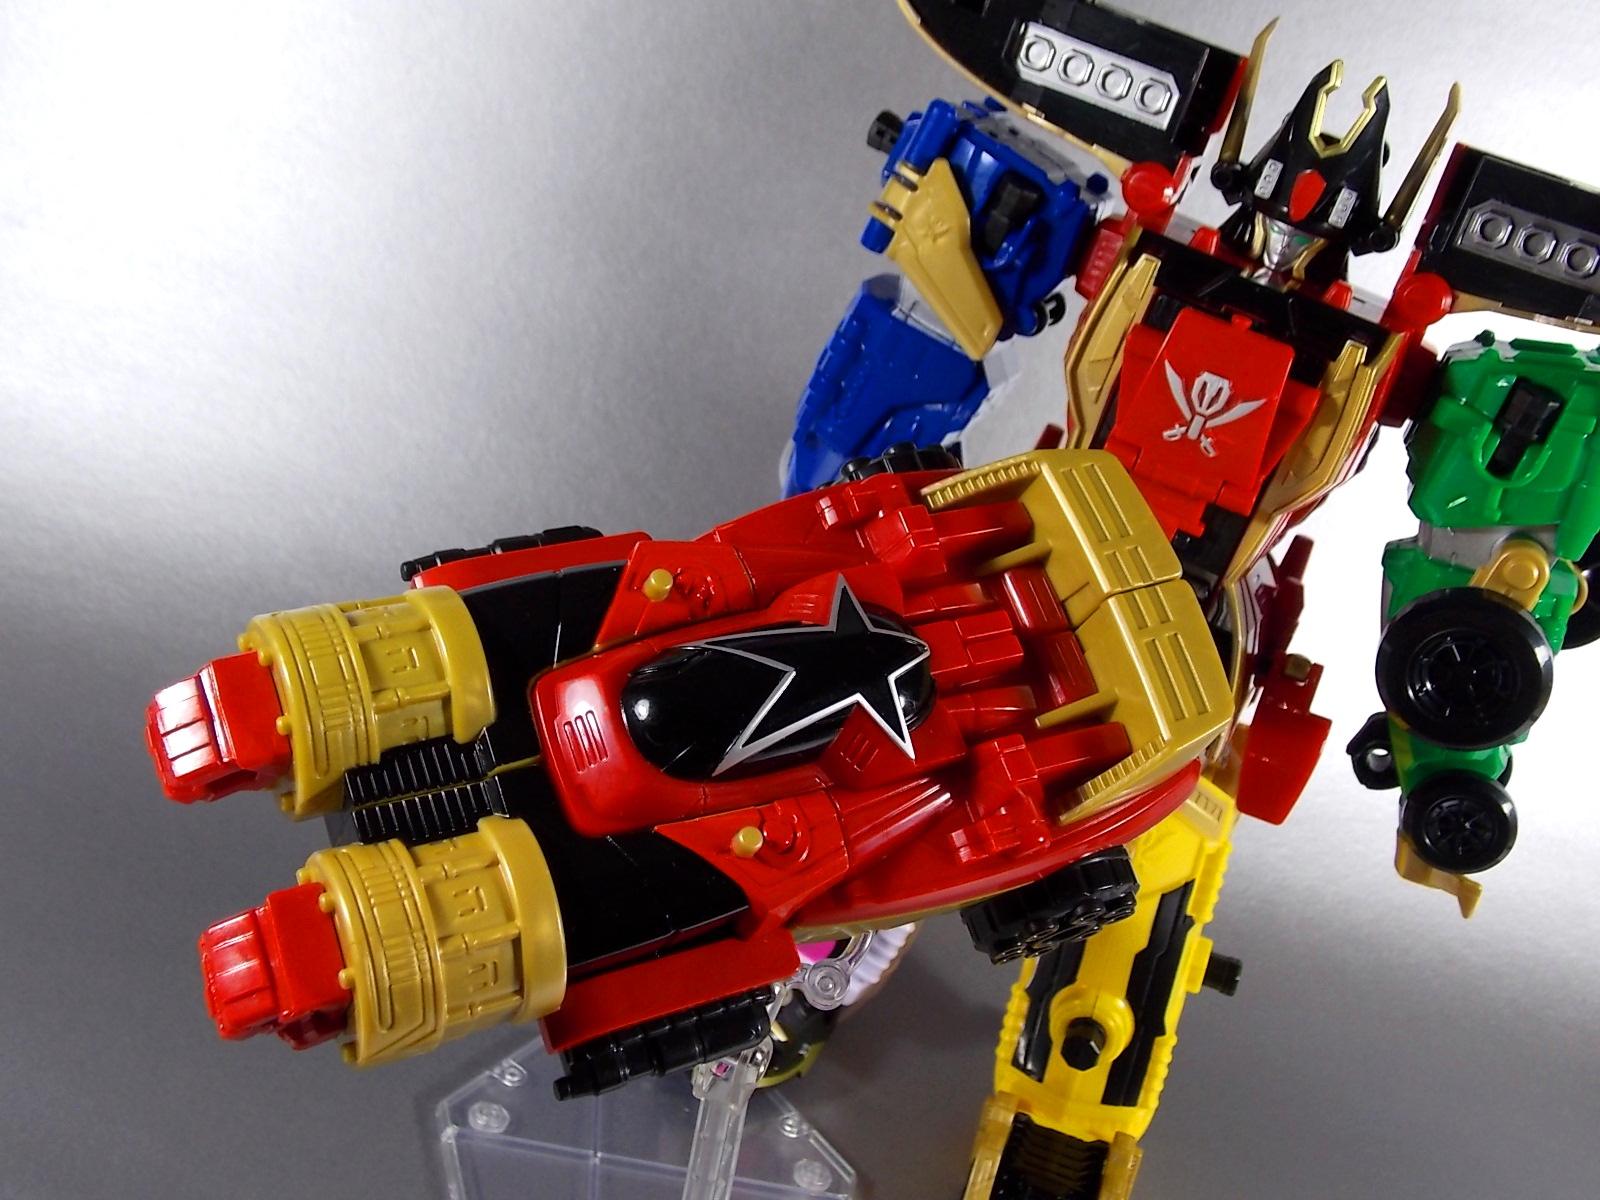 Play Power Rangers Megaforce: Zords Of Fury - Play Free ...